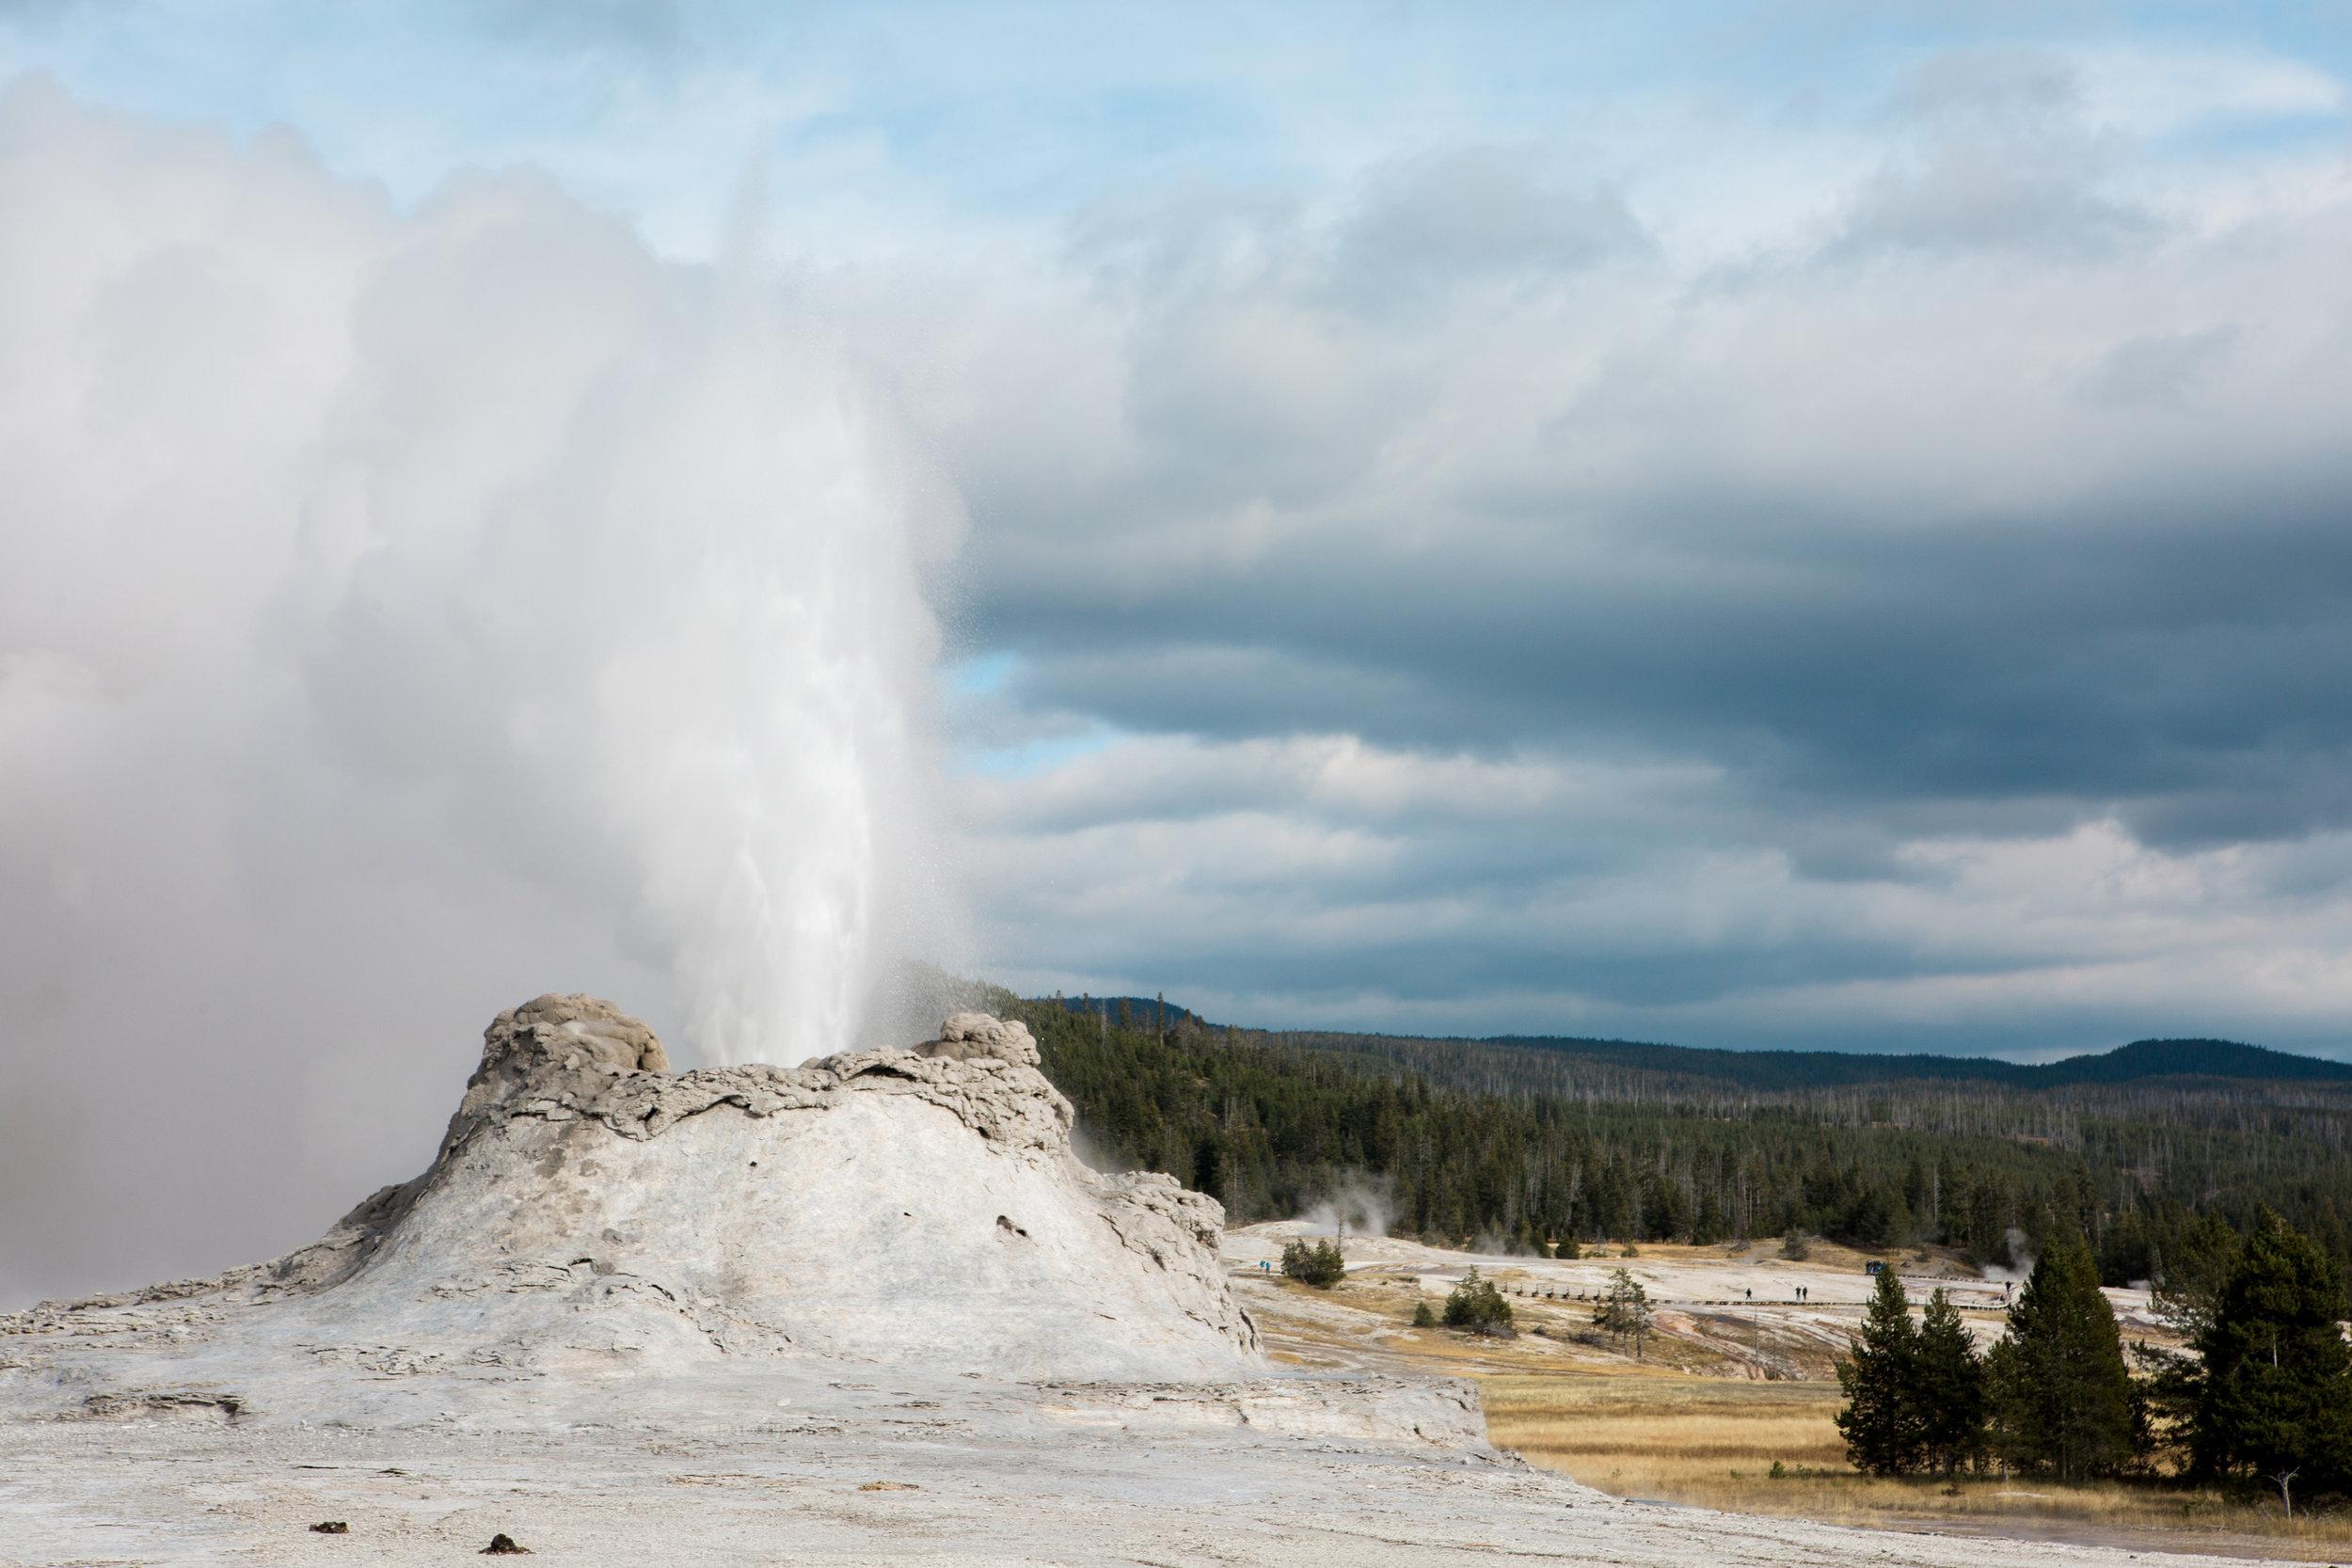 CindyGiovagnoli_outdoor_adventure_photography_Grand_Teton_Yellowstone_Glacier_National_Park_Montana_Wyoming_South_Dakota_Mount_Rushmore_Badlands-005.jpg